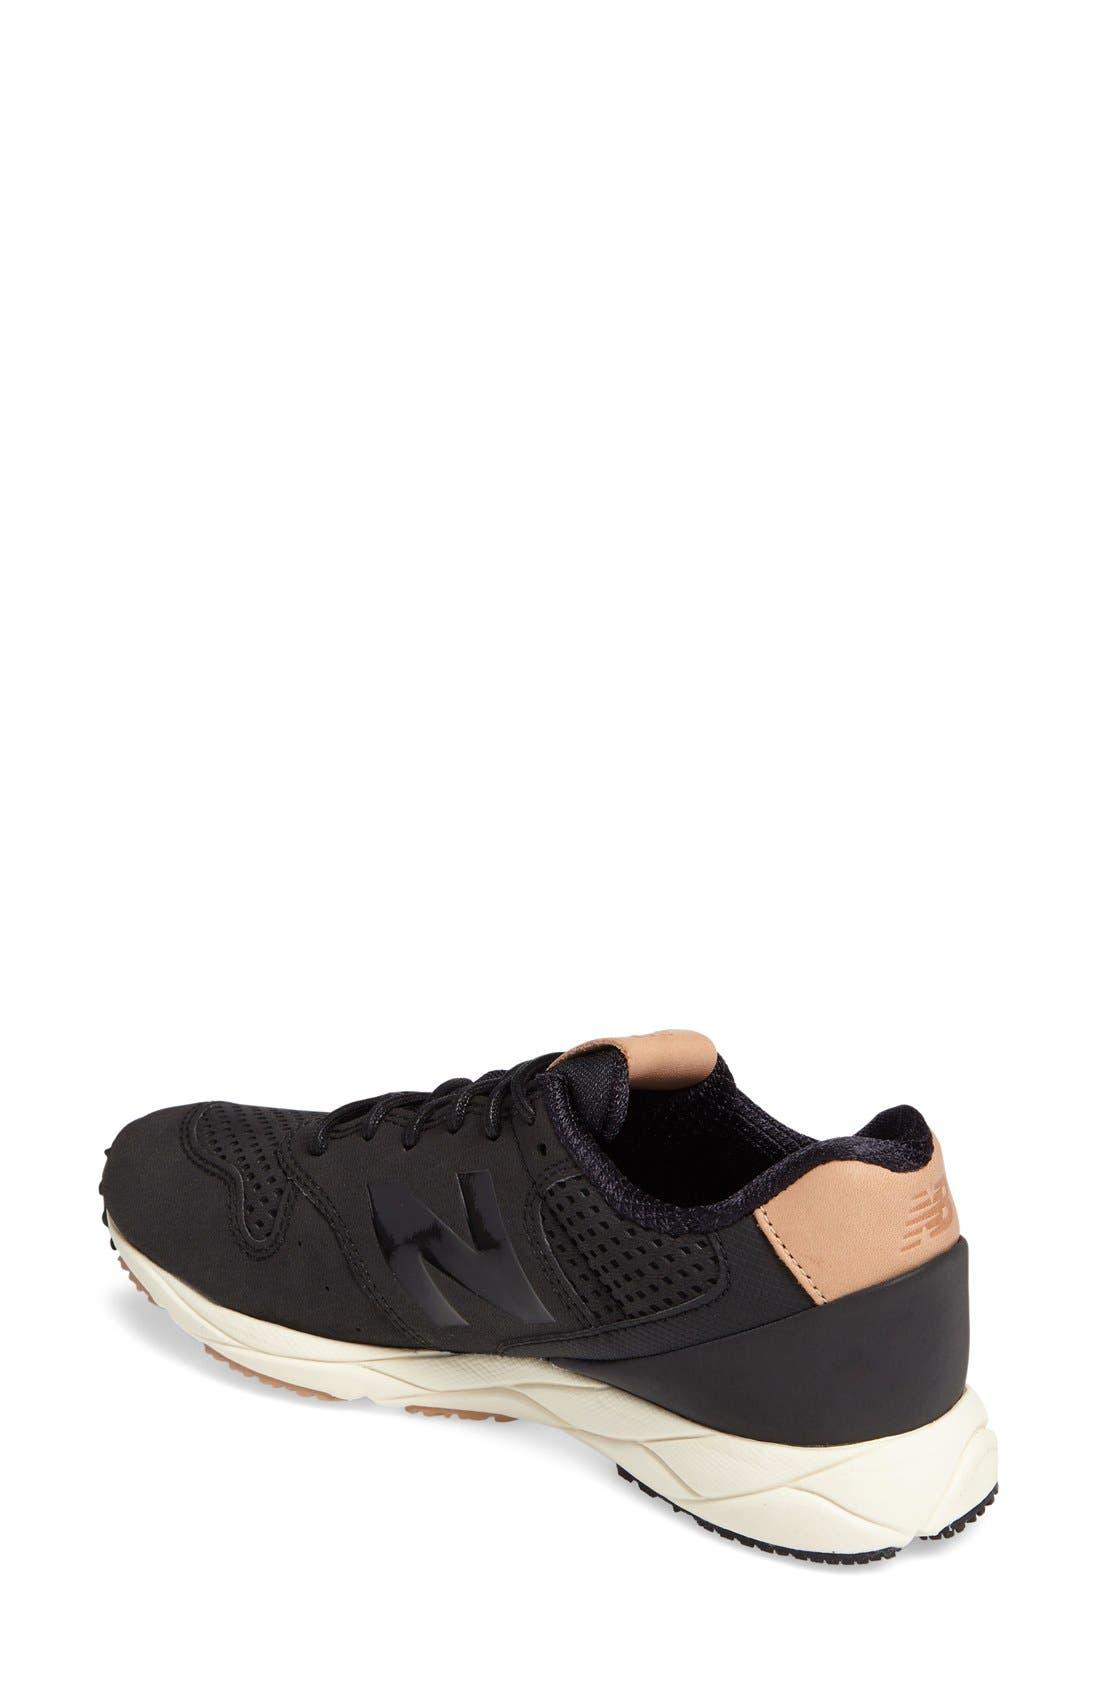 Alternate Image 2  - New Balance 96 Mash-Up Sneaker (Women)